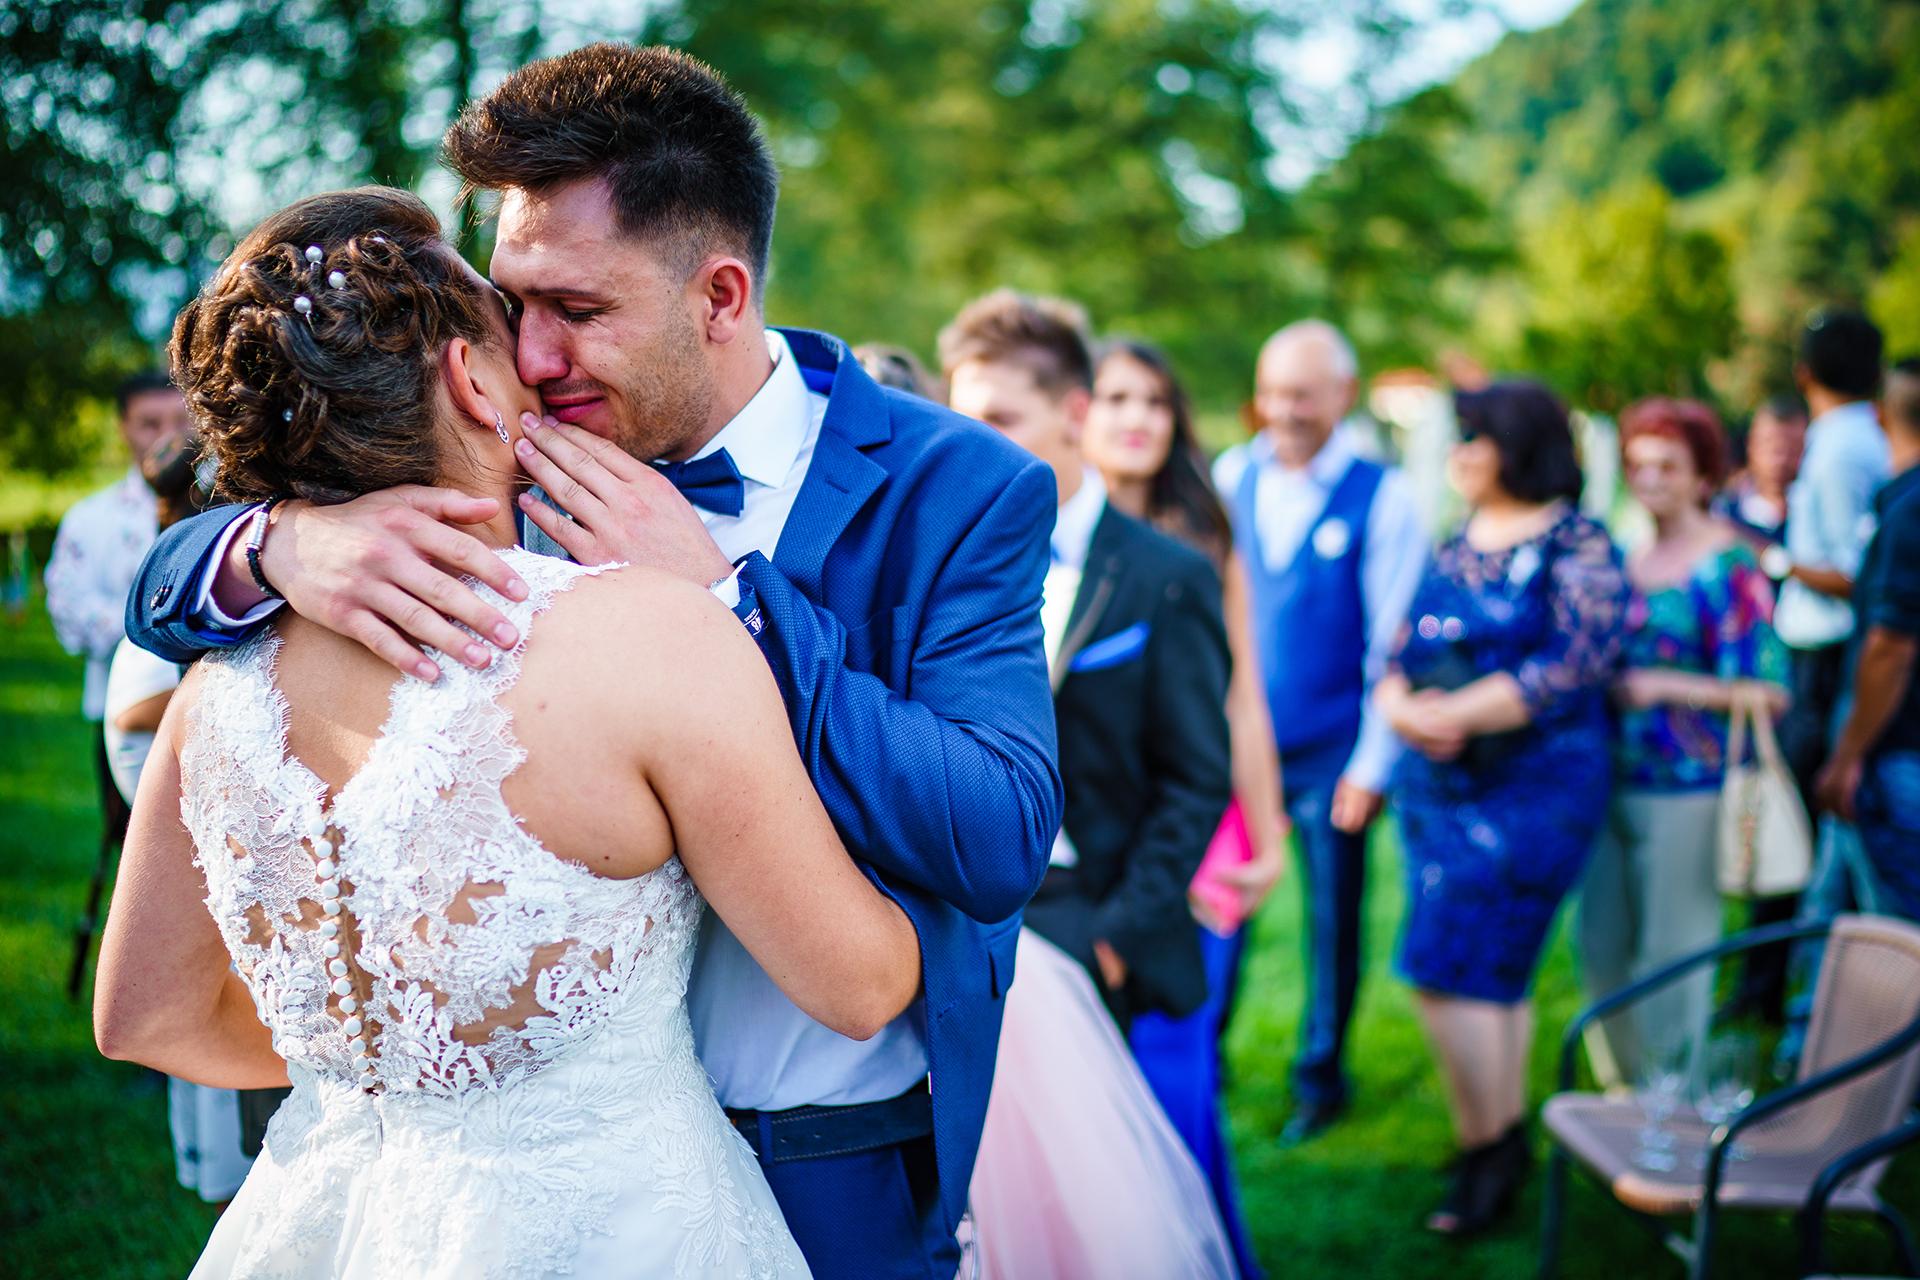 Bulgaria Elopement Photographer | the bride hugs her brother